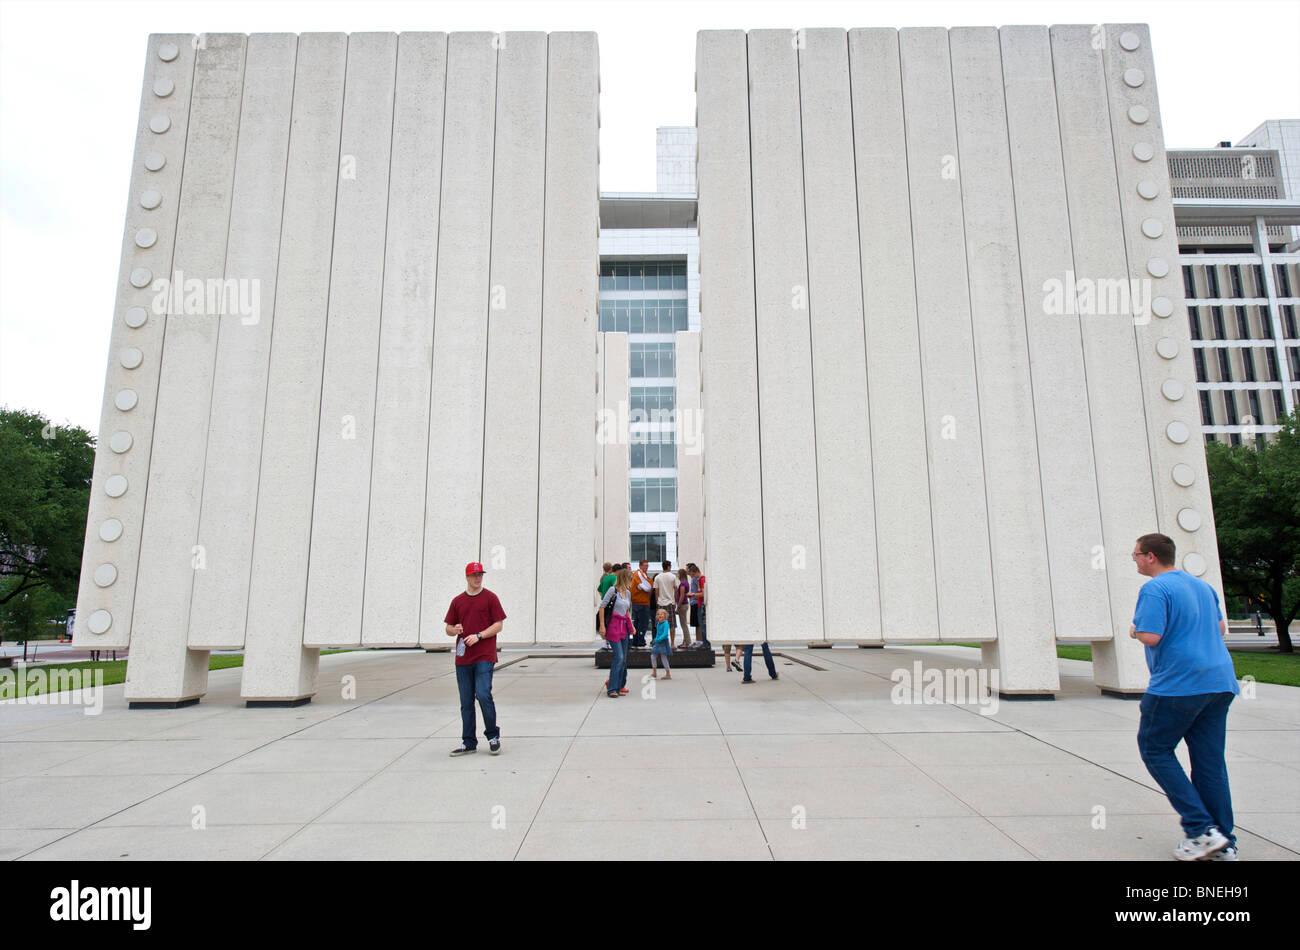 John F. Kennedy Memorial Plaza - Dallas, Texas Banque D'Images